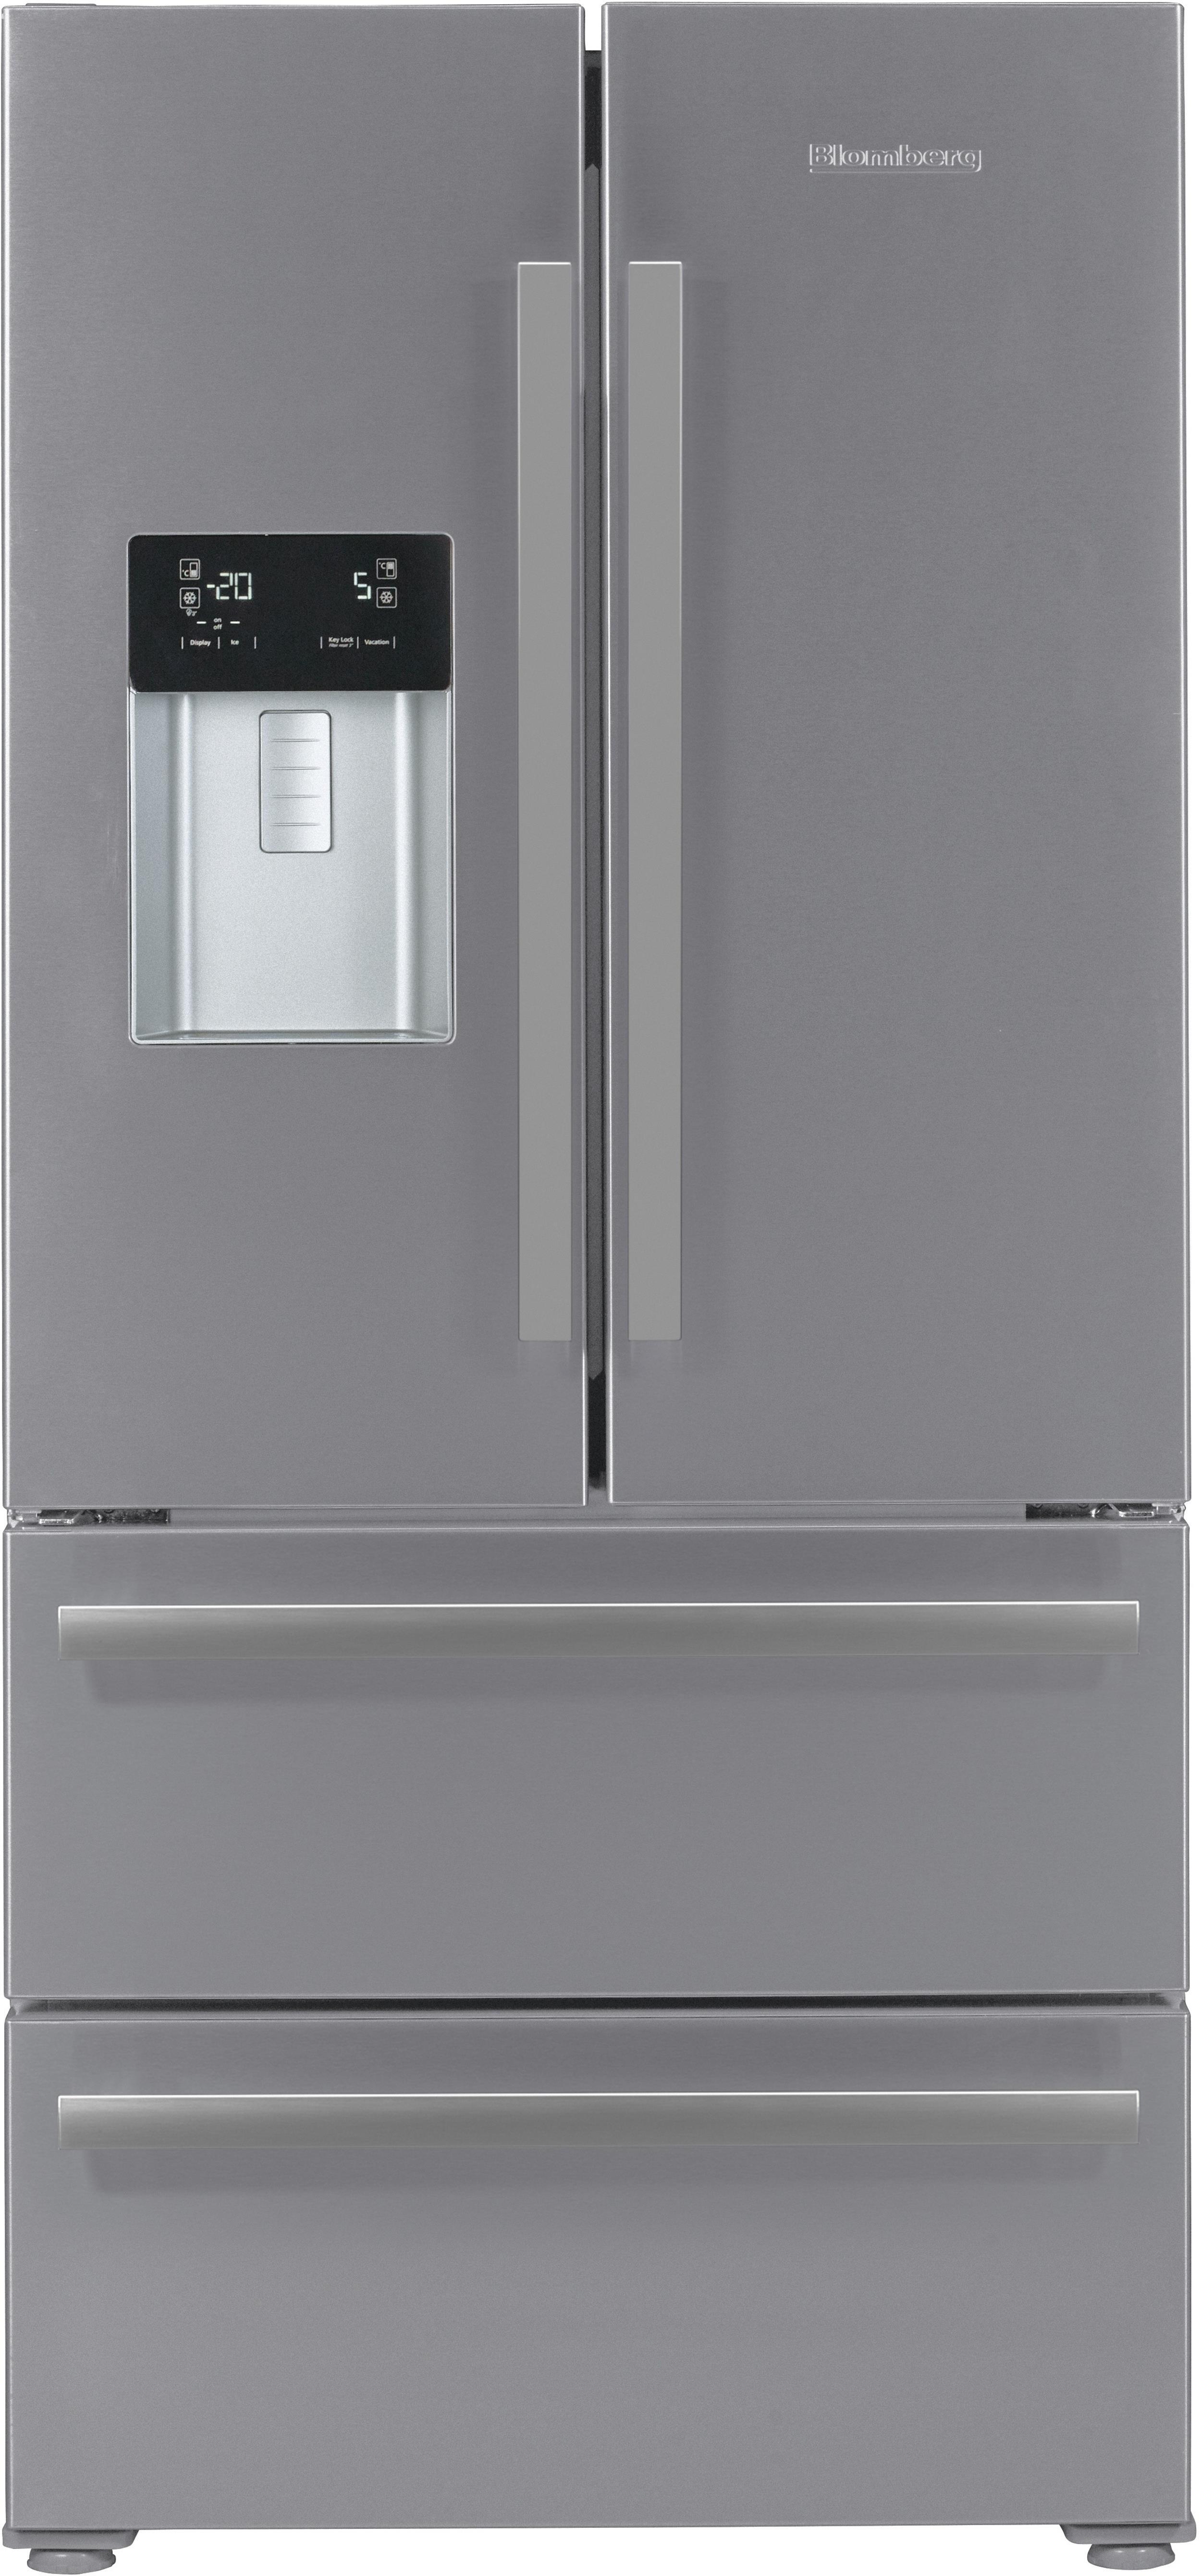 Kfd4952xd Innovative Two Door Two Drawer Fridge Freezer